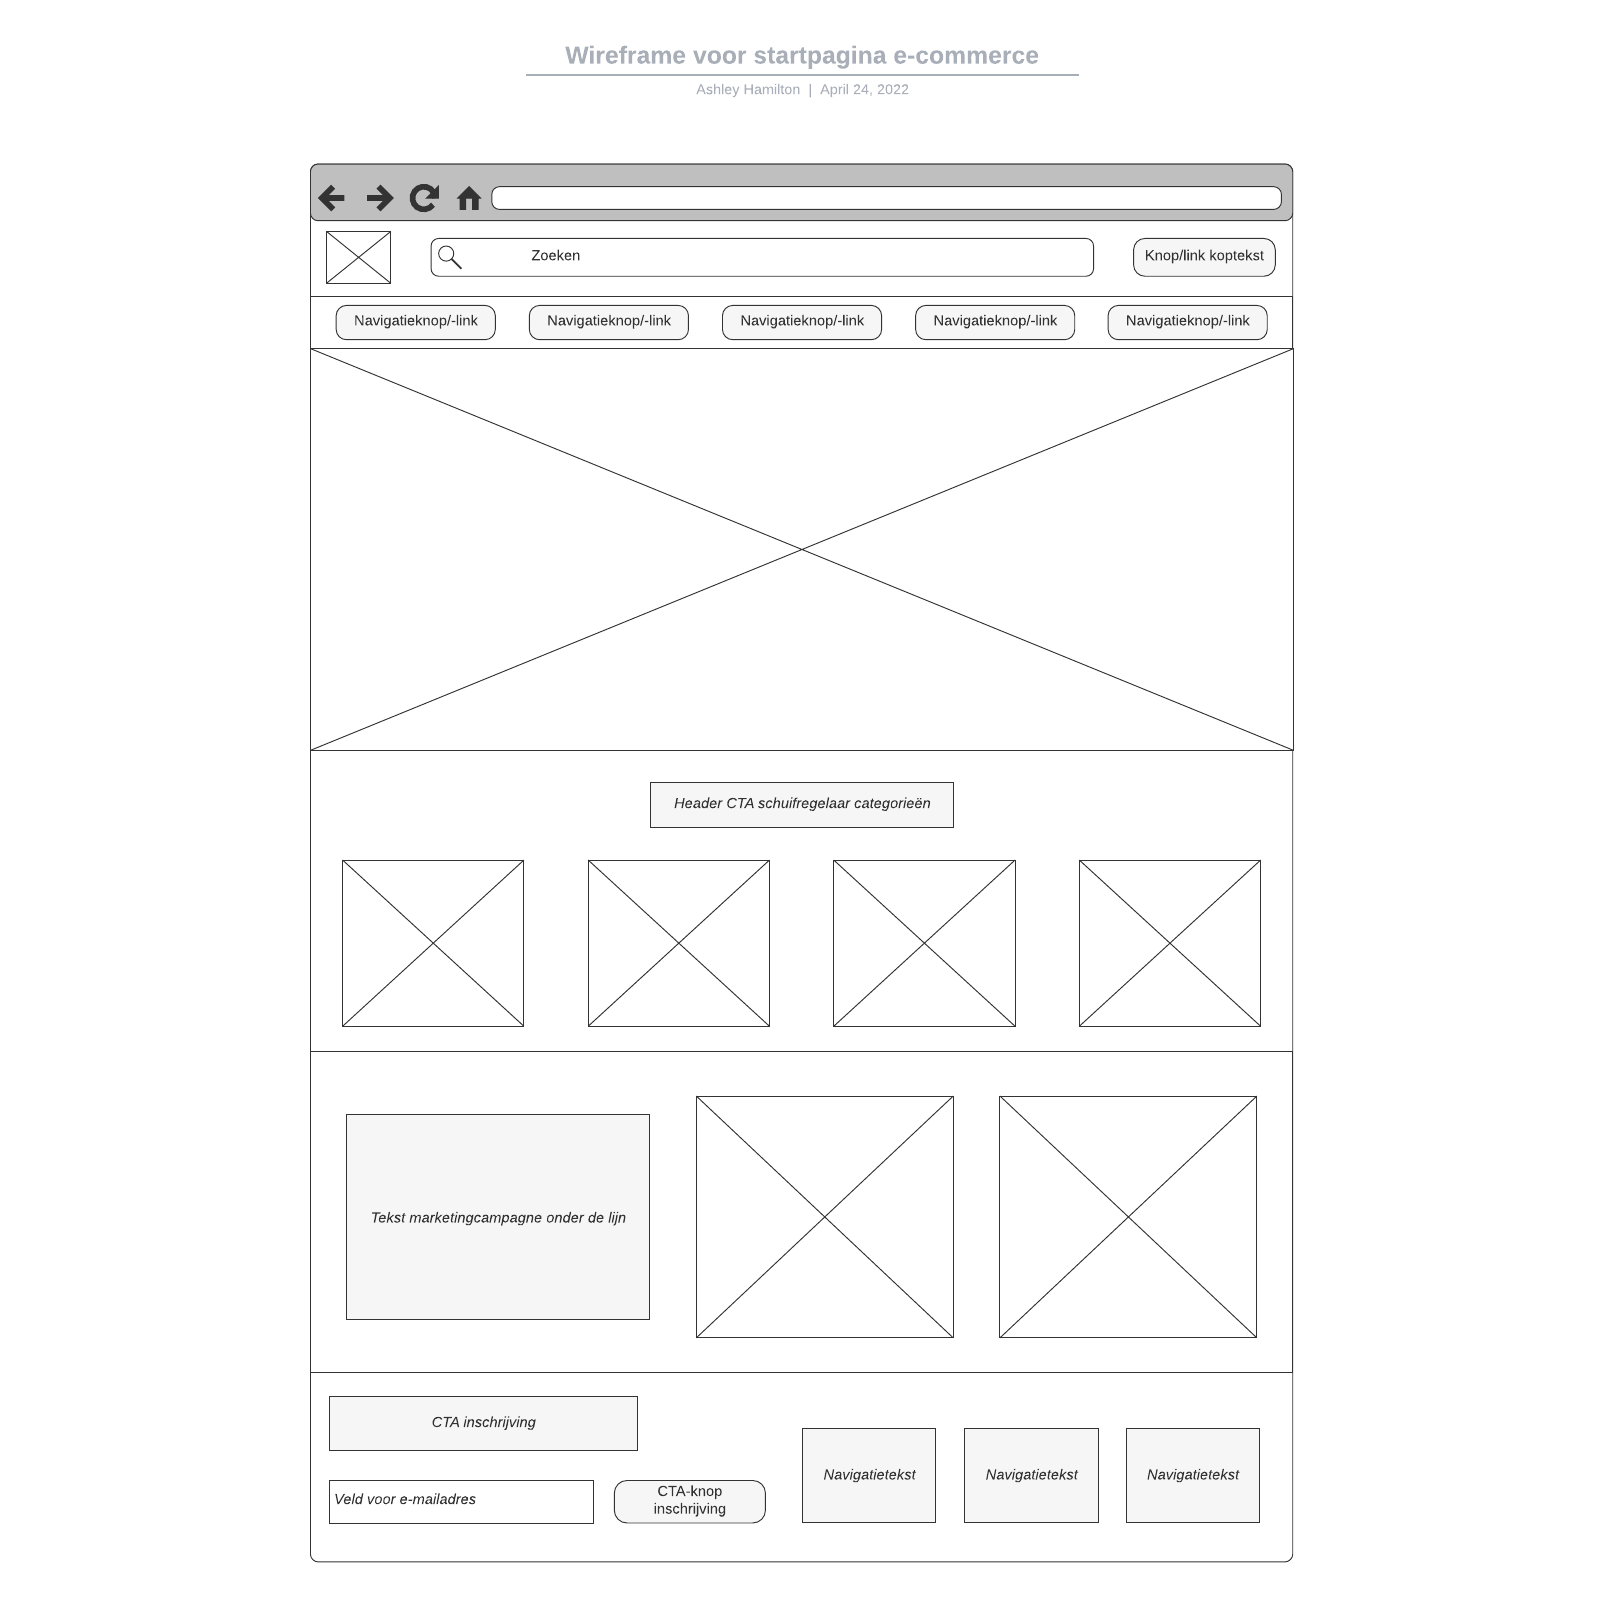 Wireframe voor startpagina e-commerce